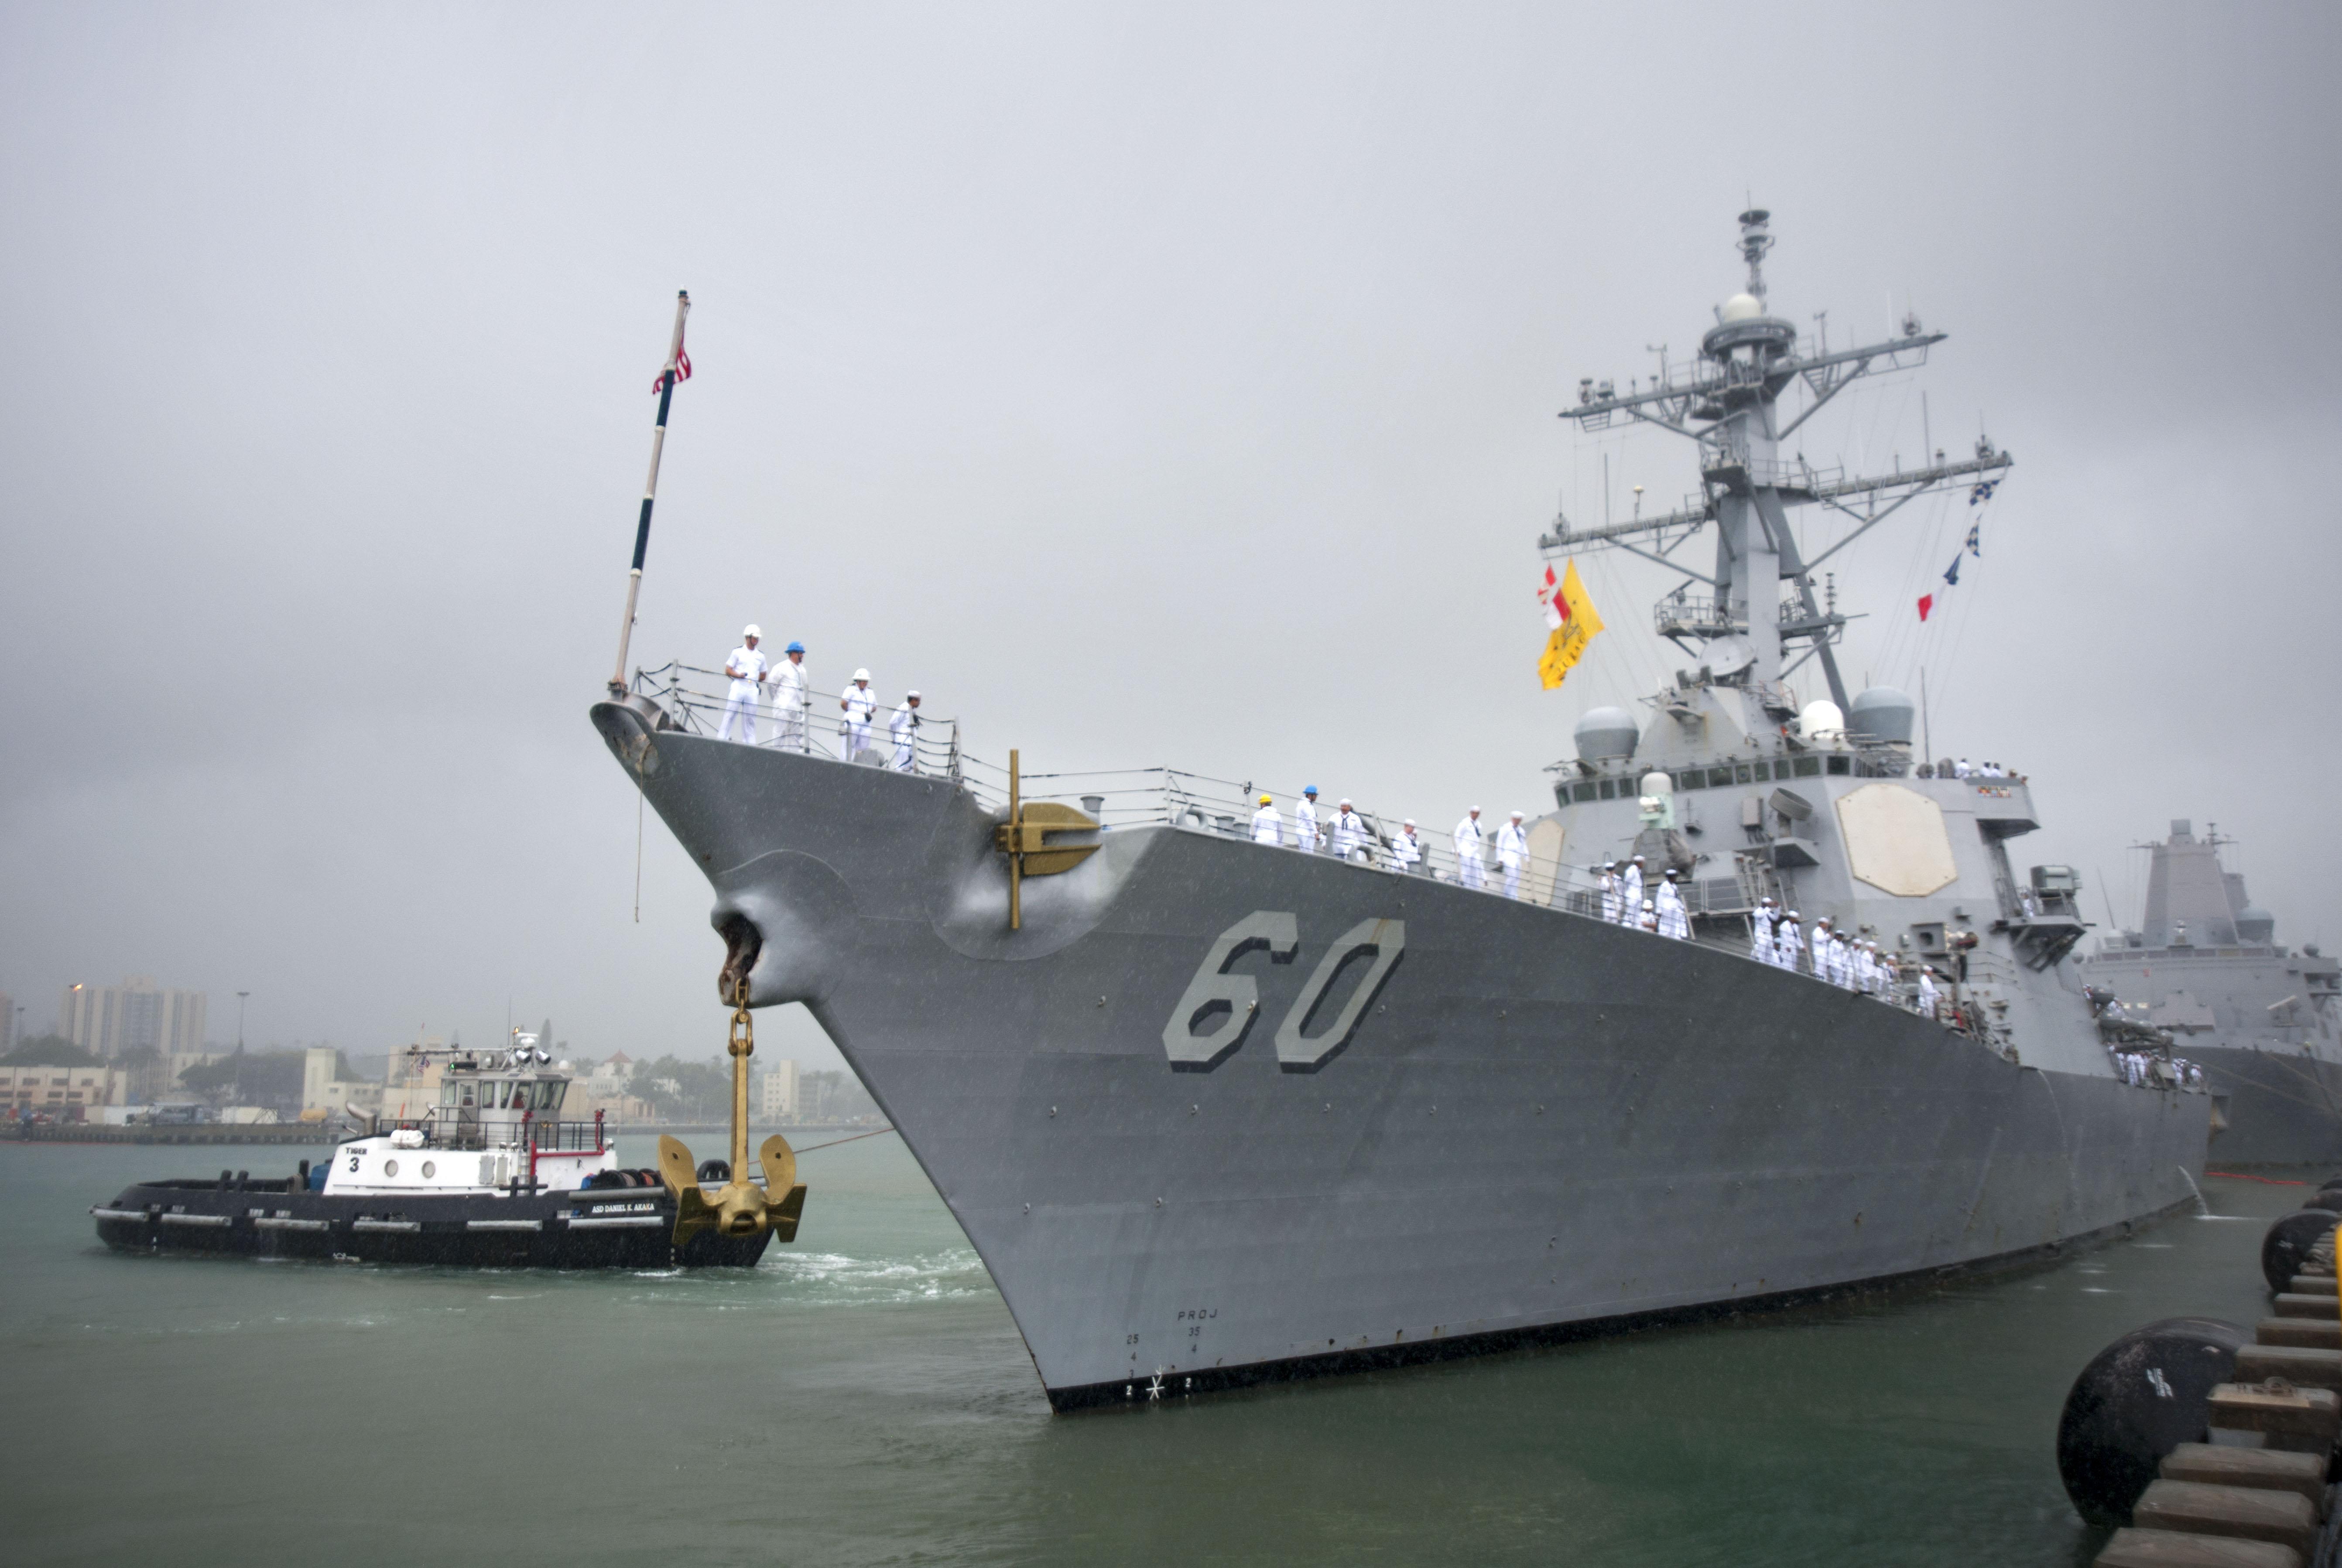 USS PAUL HAMILTON DDG-60 Auslaufen Pearl Harbor am 14.02.2015 Bild: U.S. Navy